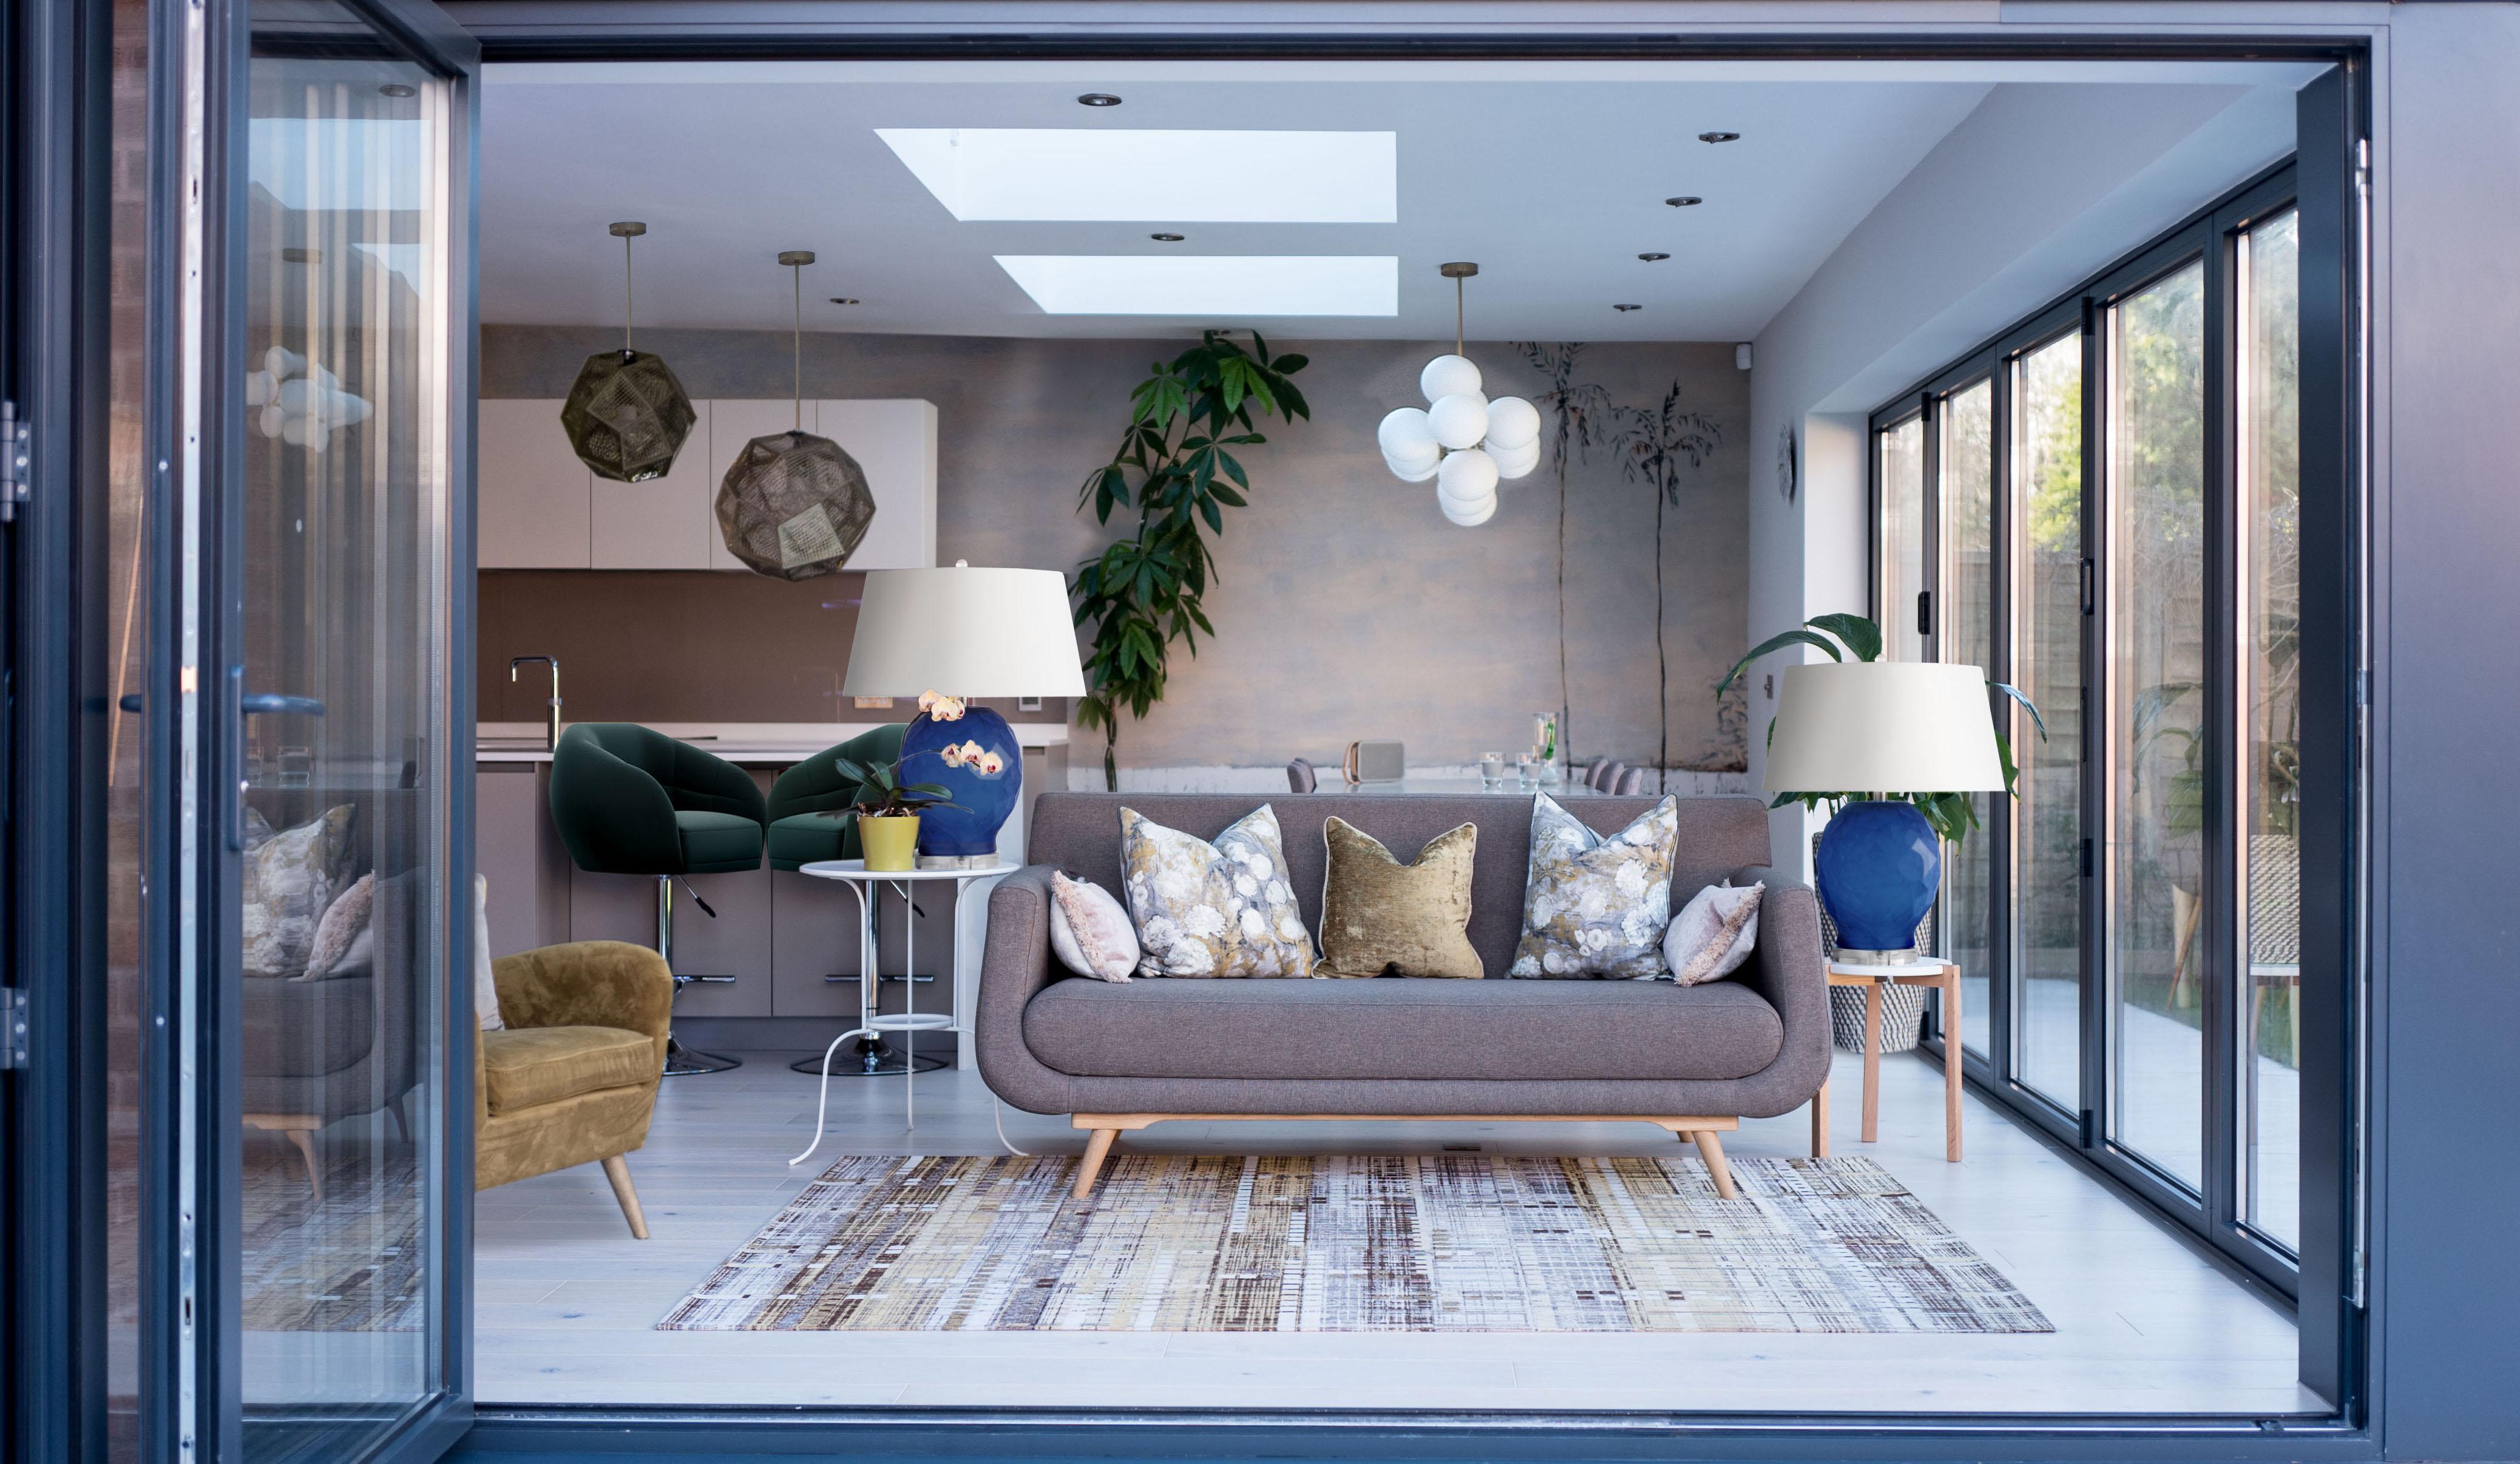 interior design west london living room small 2